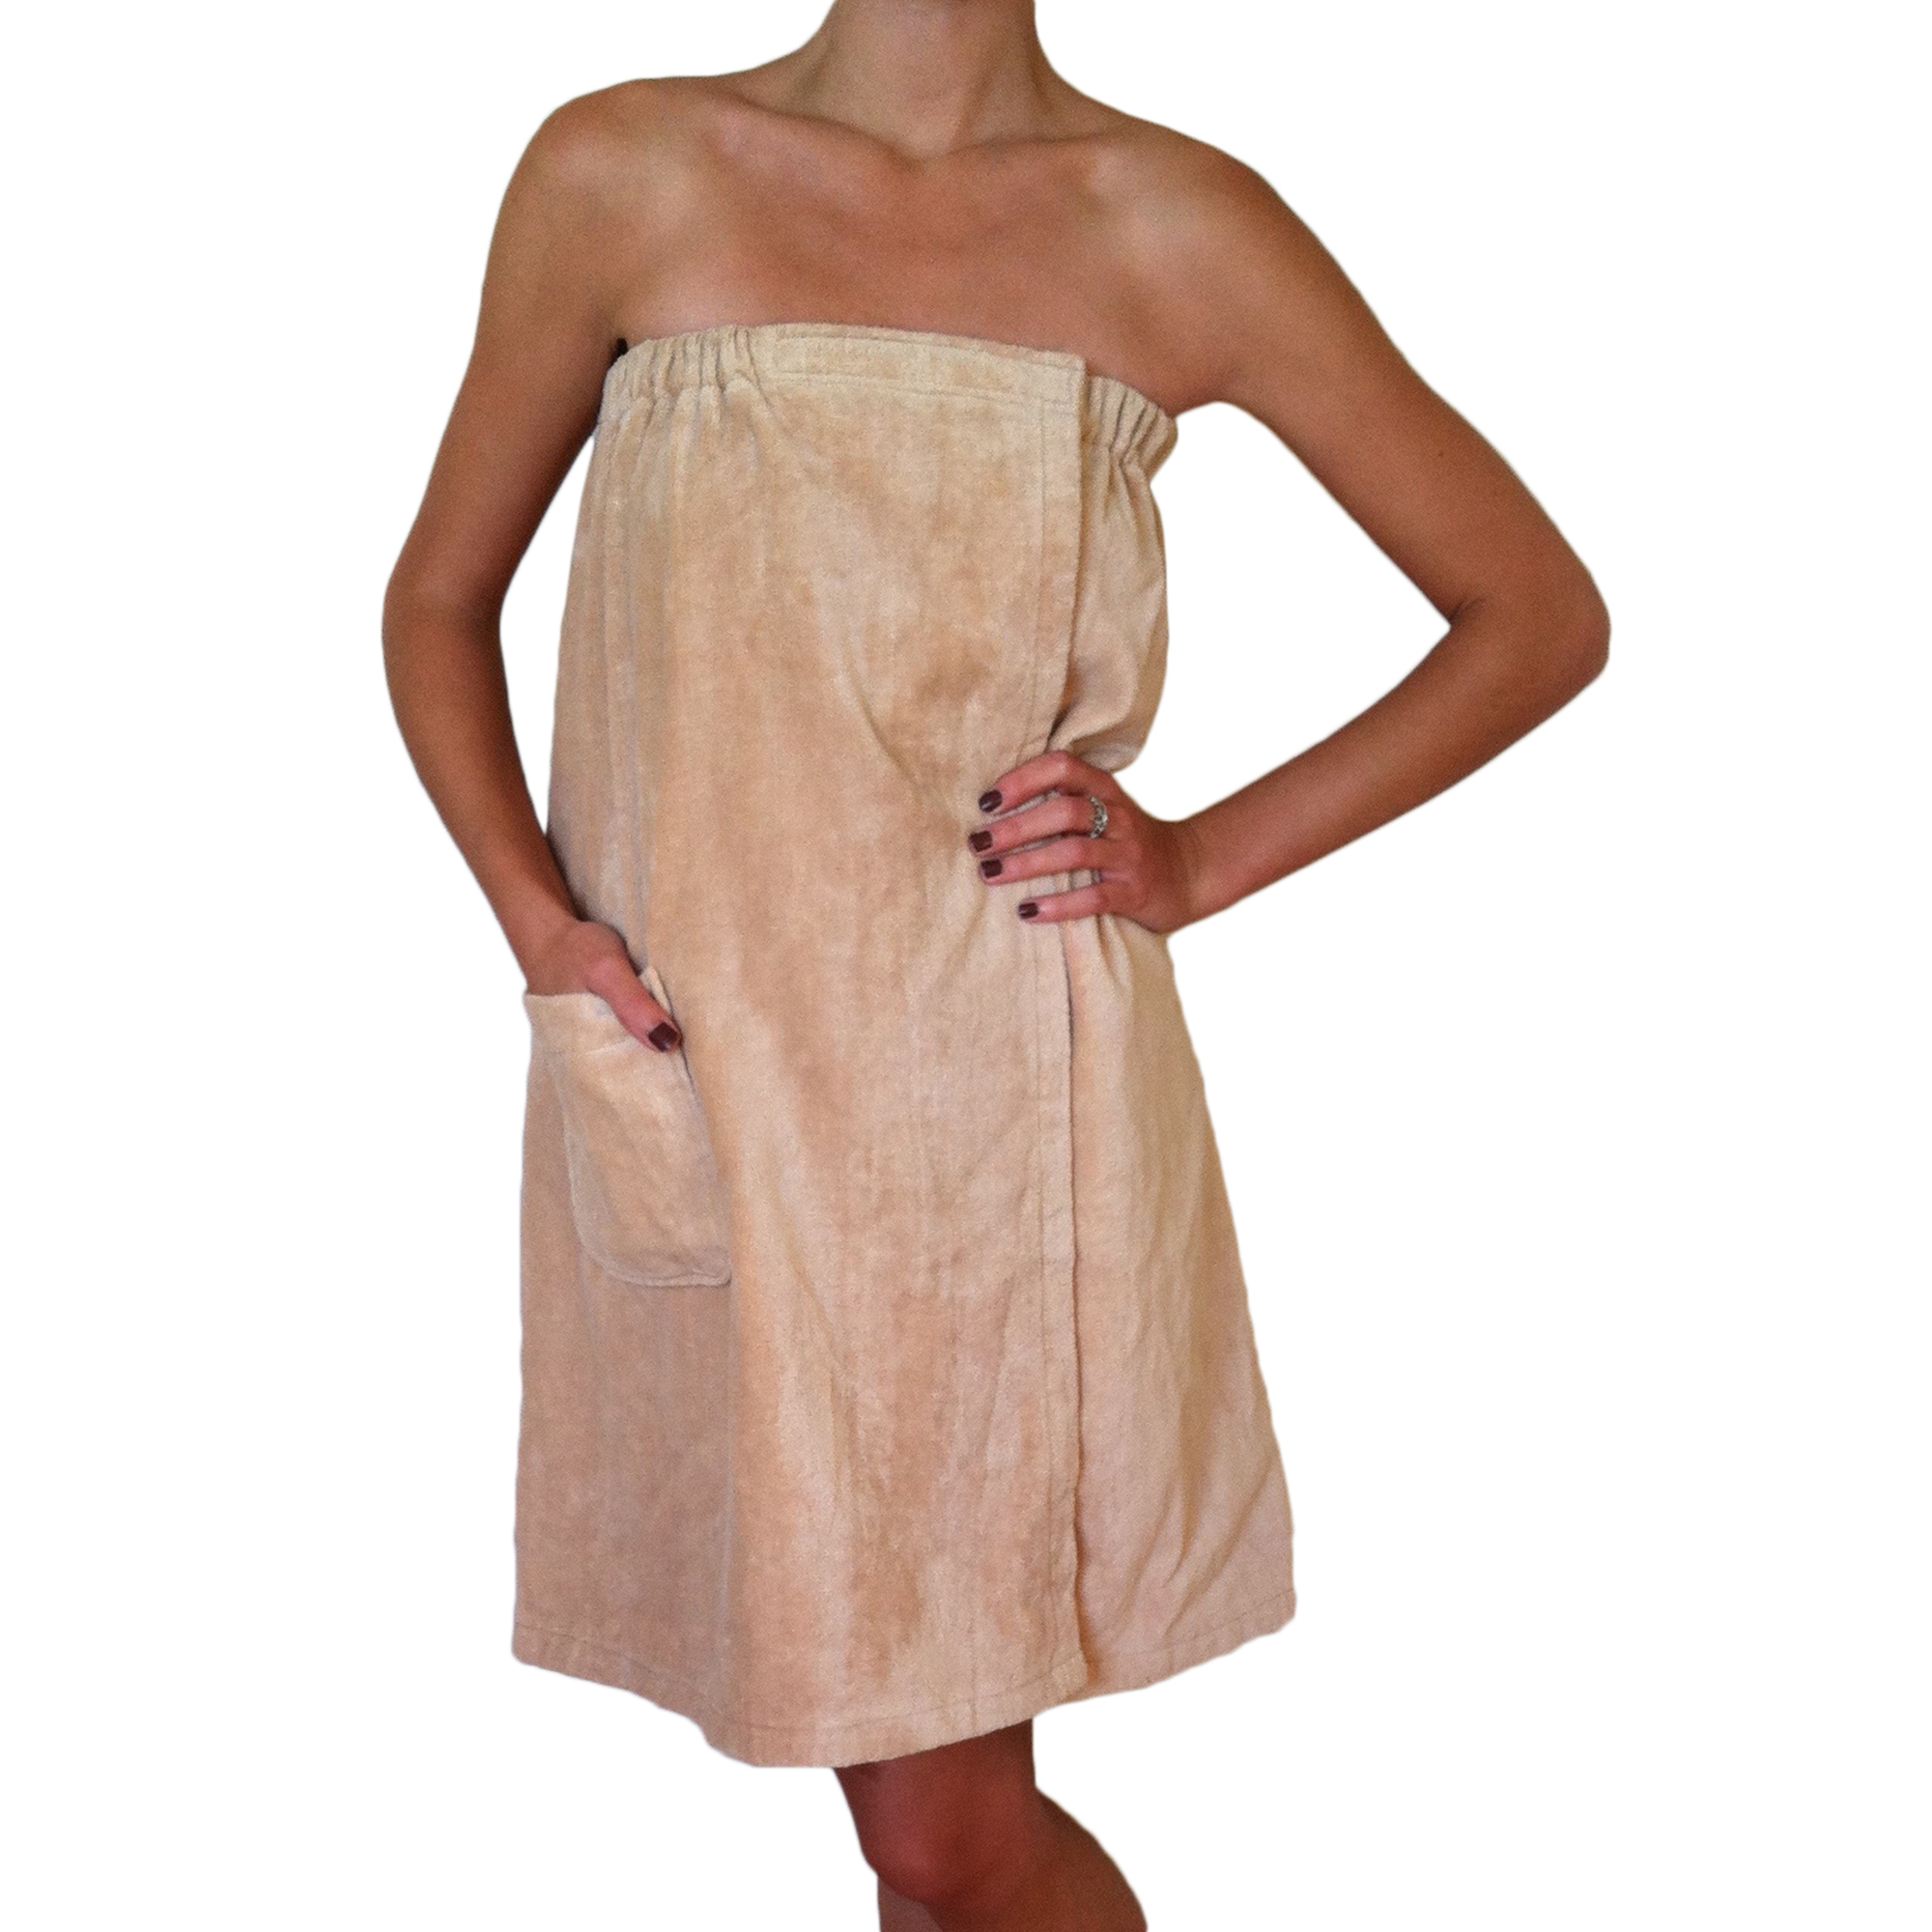 Radiant Saunas Women's Spa & Bath Terry Cloth Towel Wrap - Tan